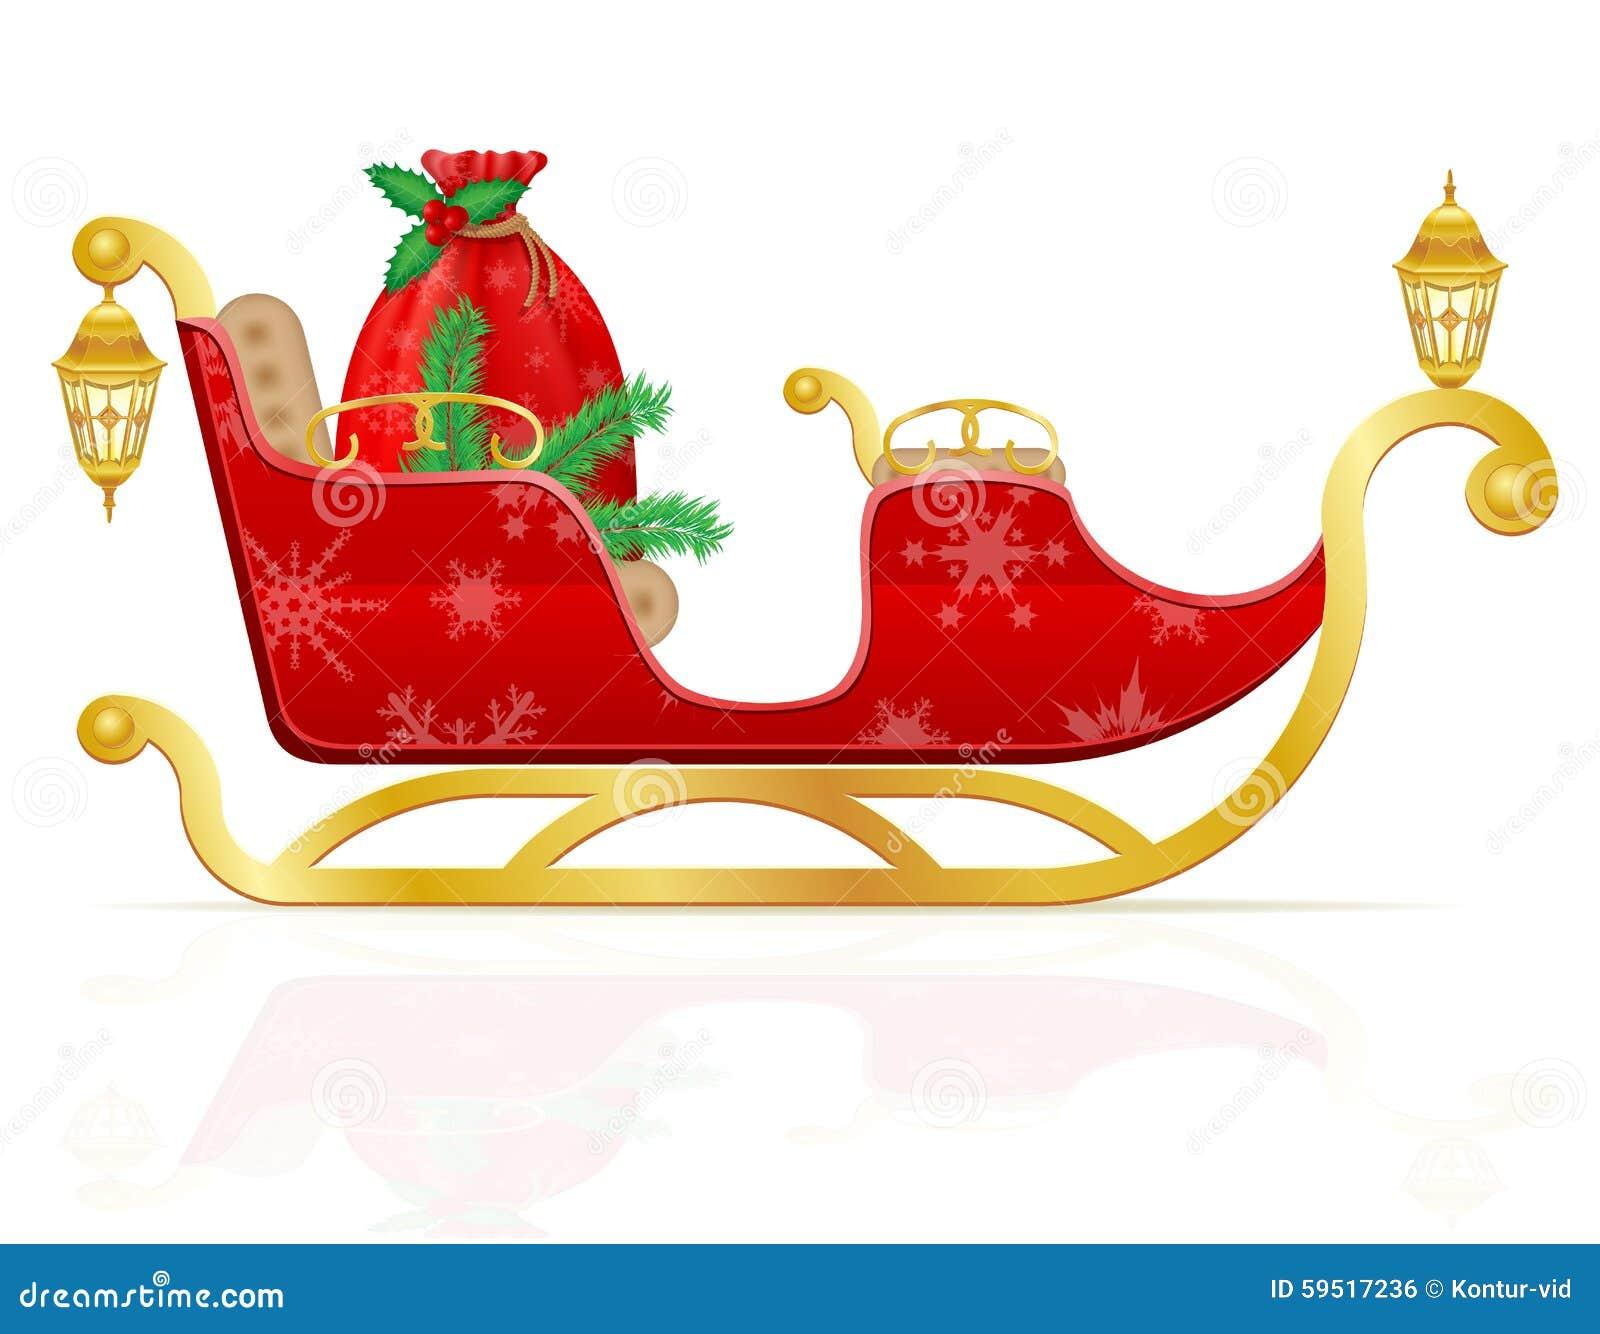 le tra neau rouge de no l du p re no l avec des cadeaux dirigent l 39 illustrati illustration de. Black Bedroom Furniture Sets. Home Design Ideas